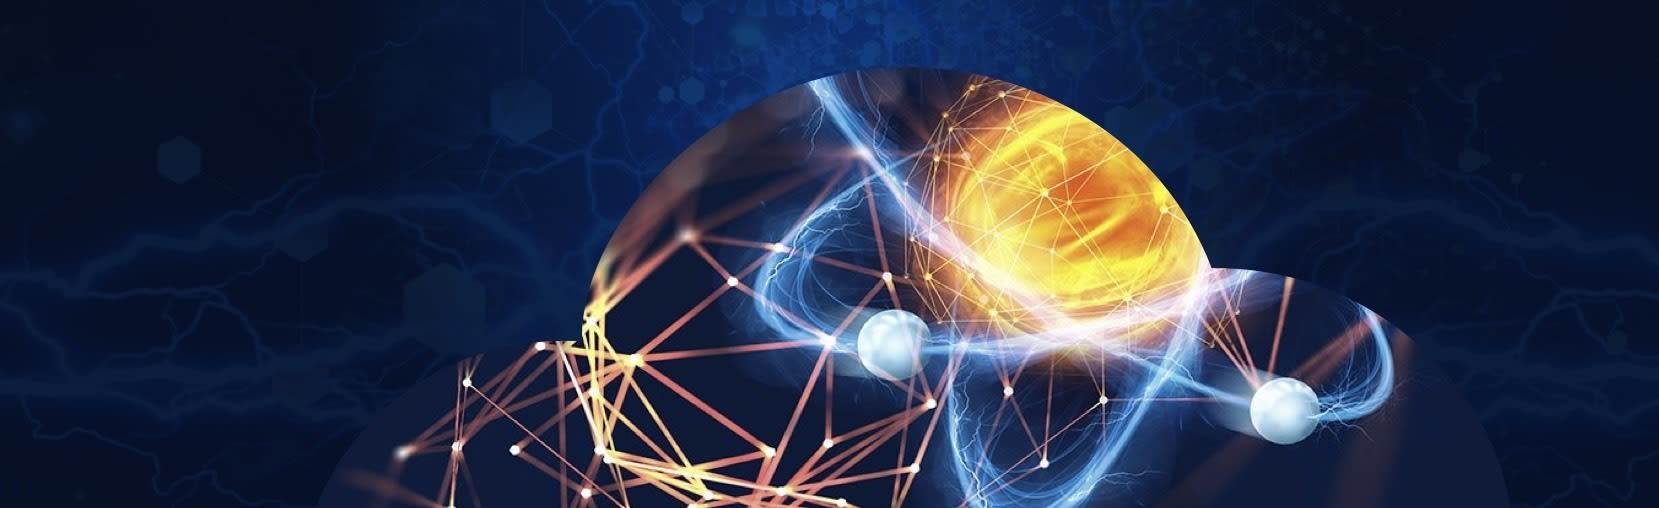 Atomic swaps, cross-chain & blockchain interoperability